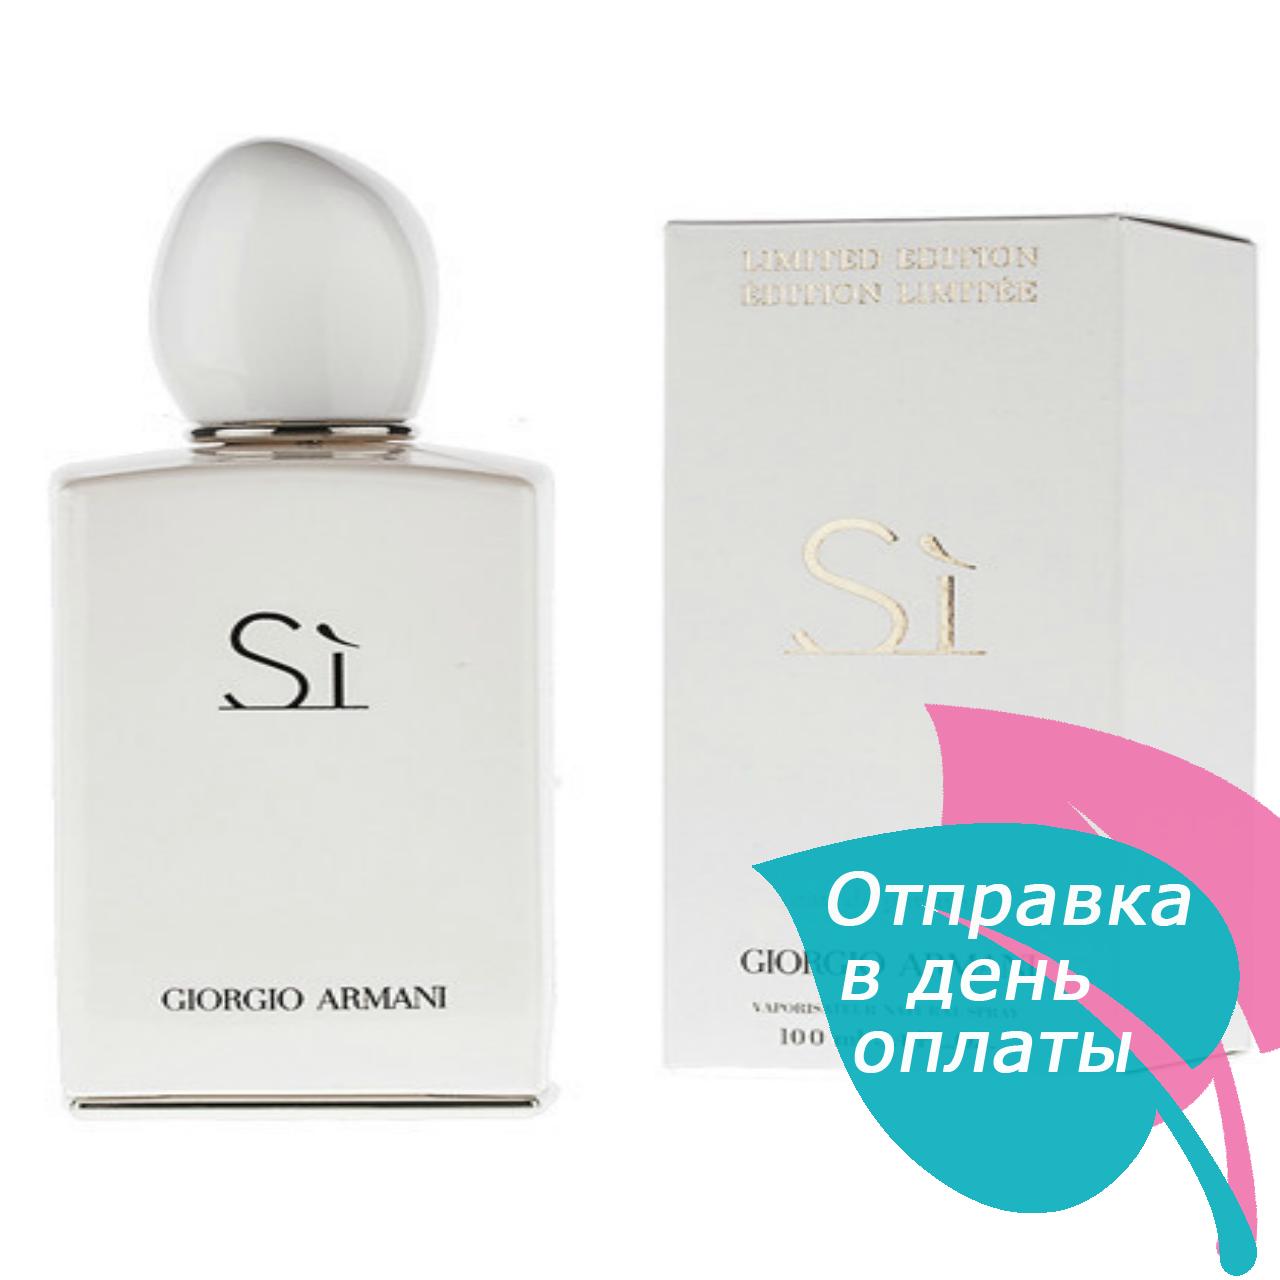 Женская парфюмированная вода Giorgio Armani Si White Limited Edition, 100 мл